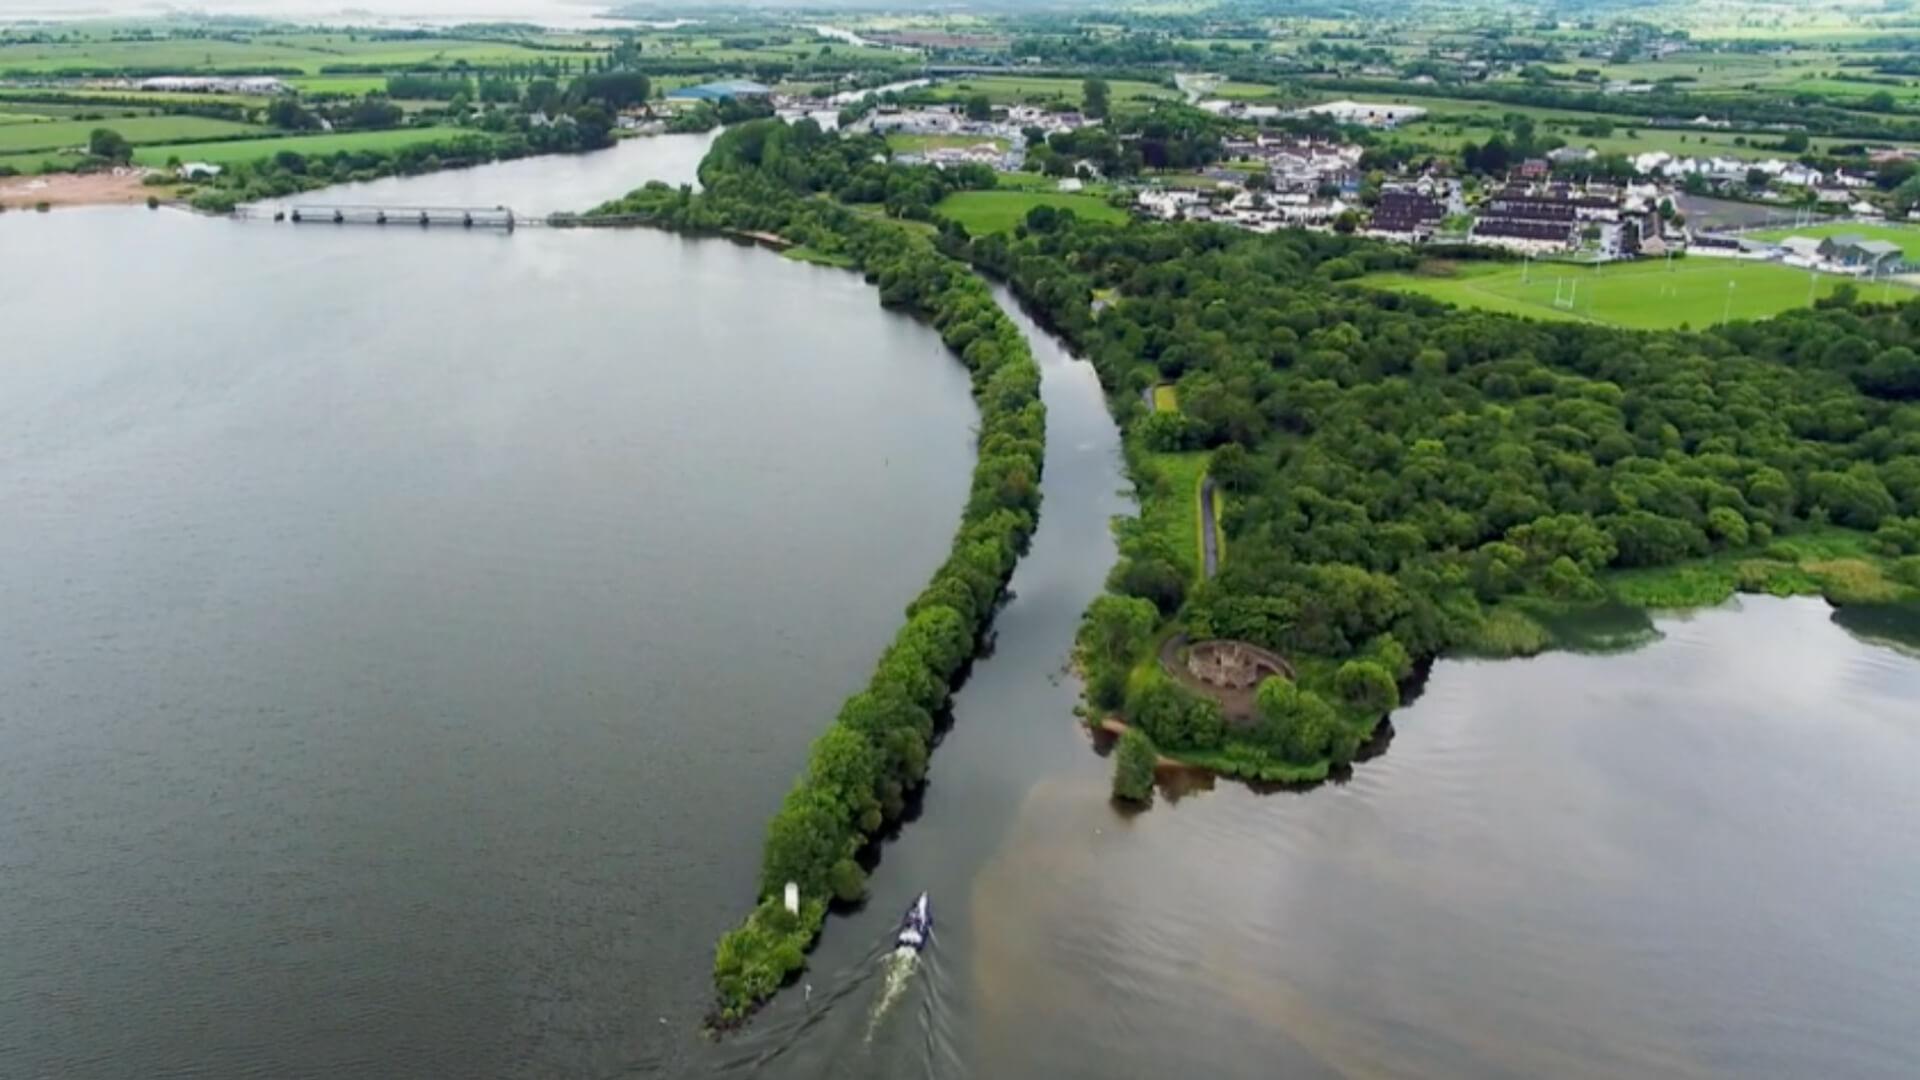 Lough Neagh Boat Trip